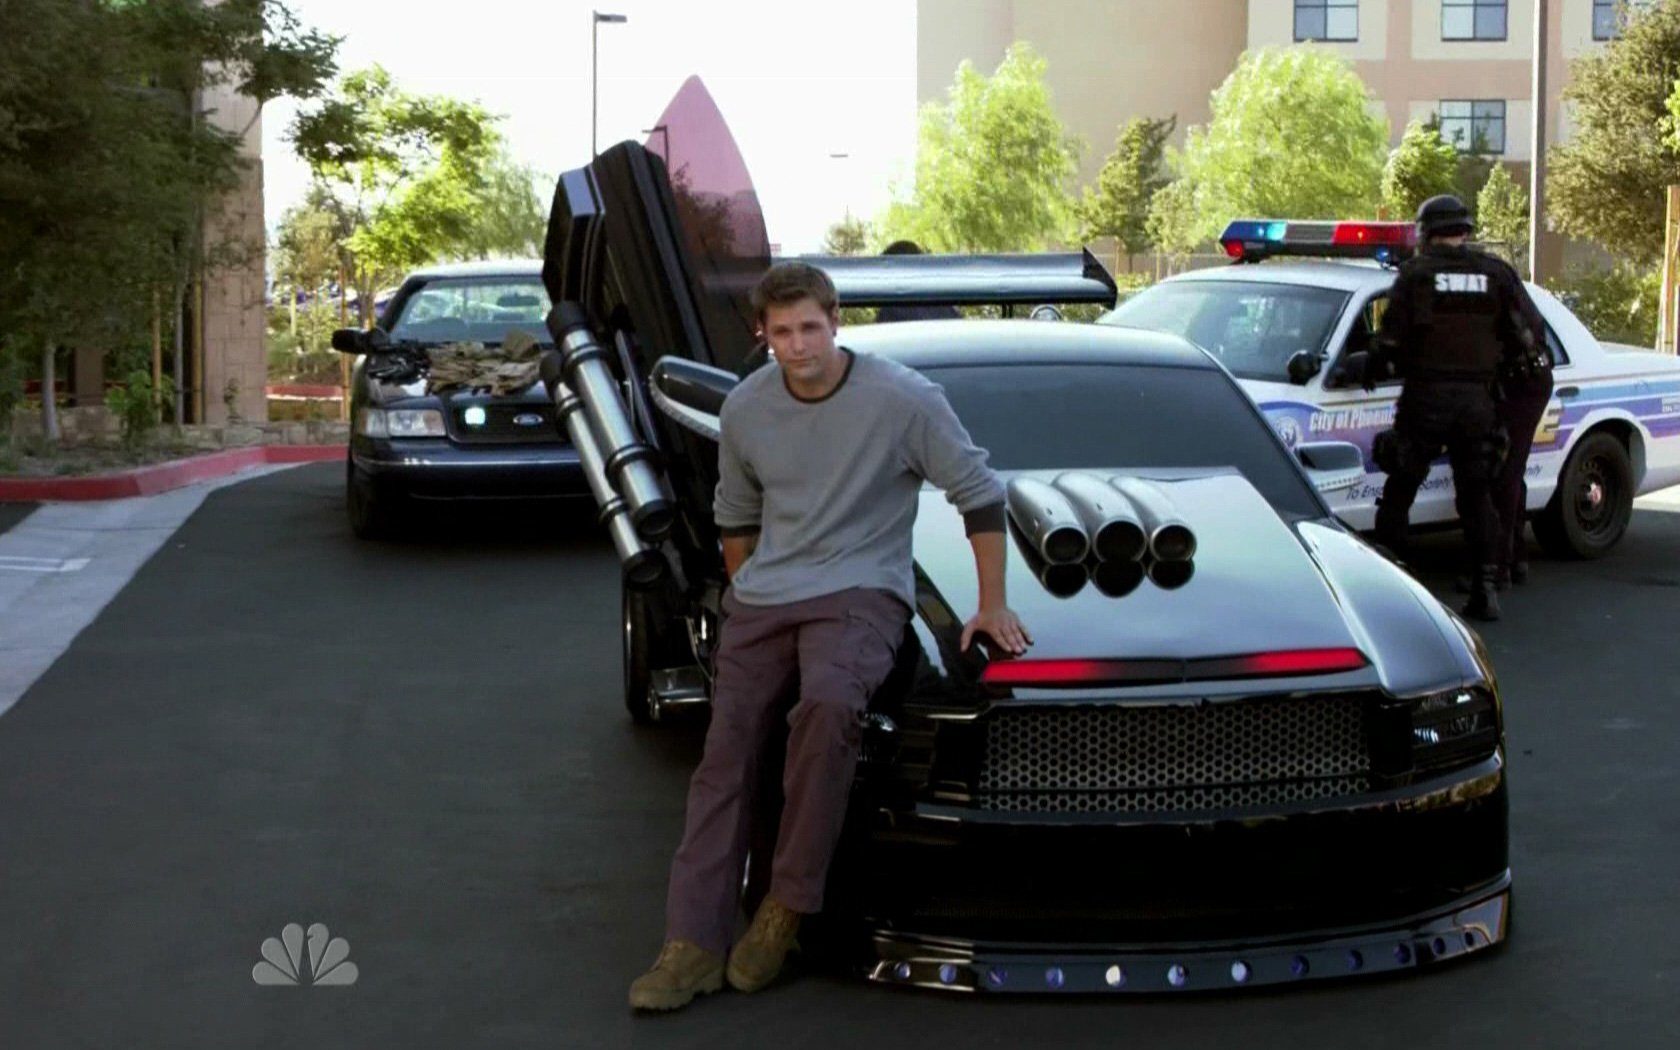 cars vehicles Ford Mustang TV series Knight Rider bodykit wallpaper 1680x1050